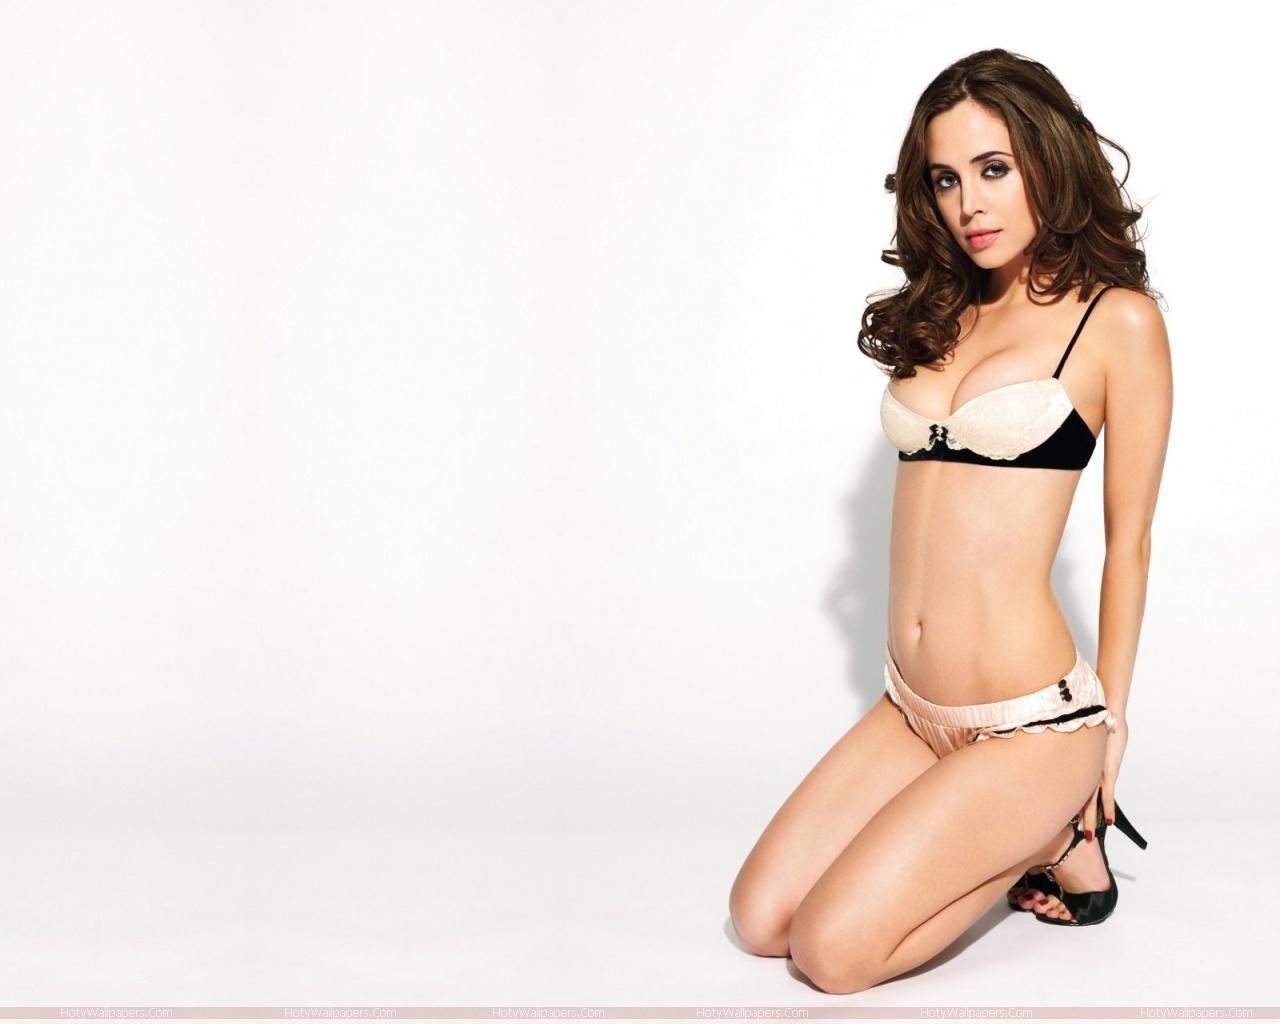 Eliza dushku bikini photos